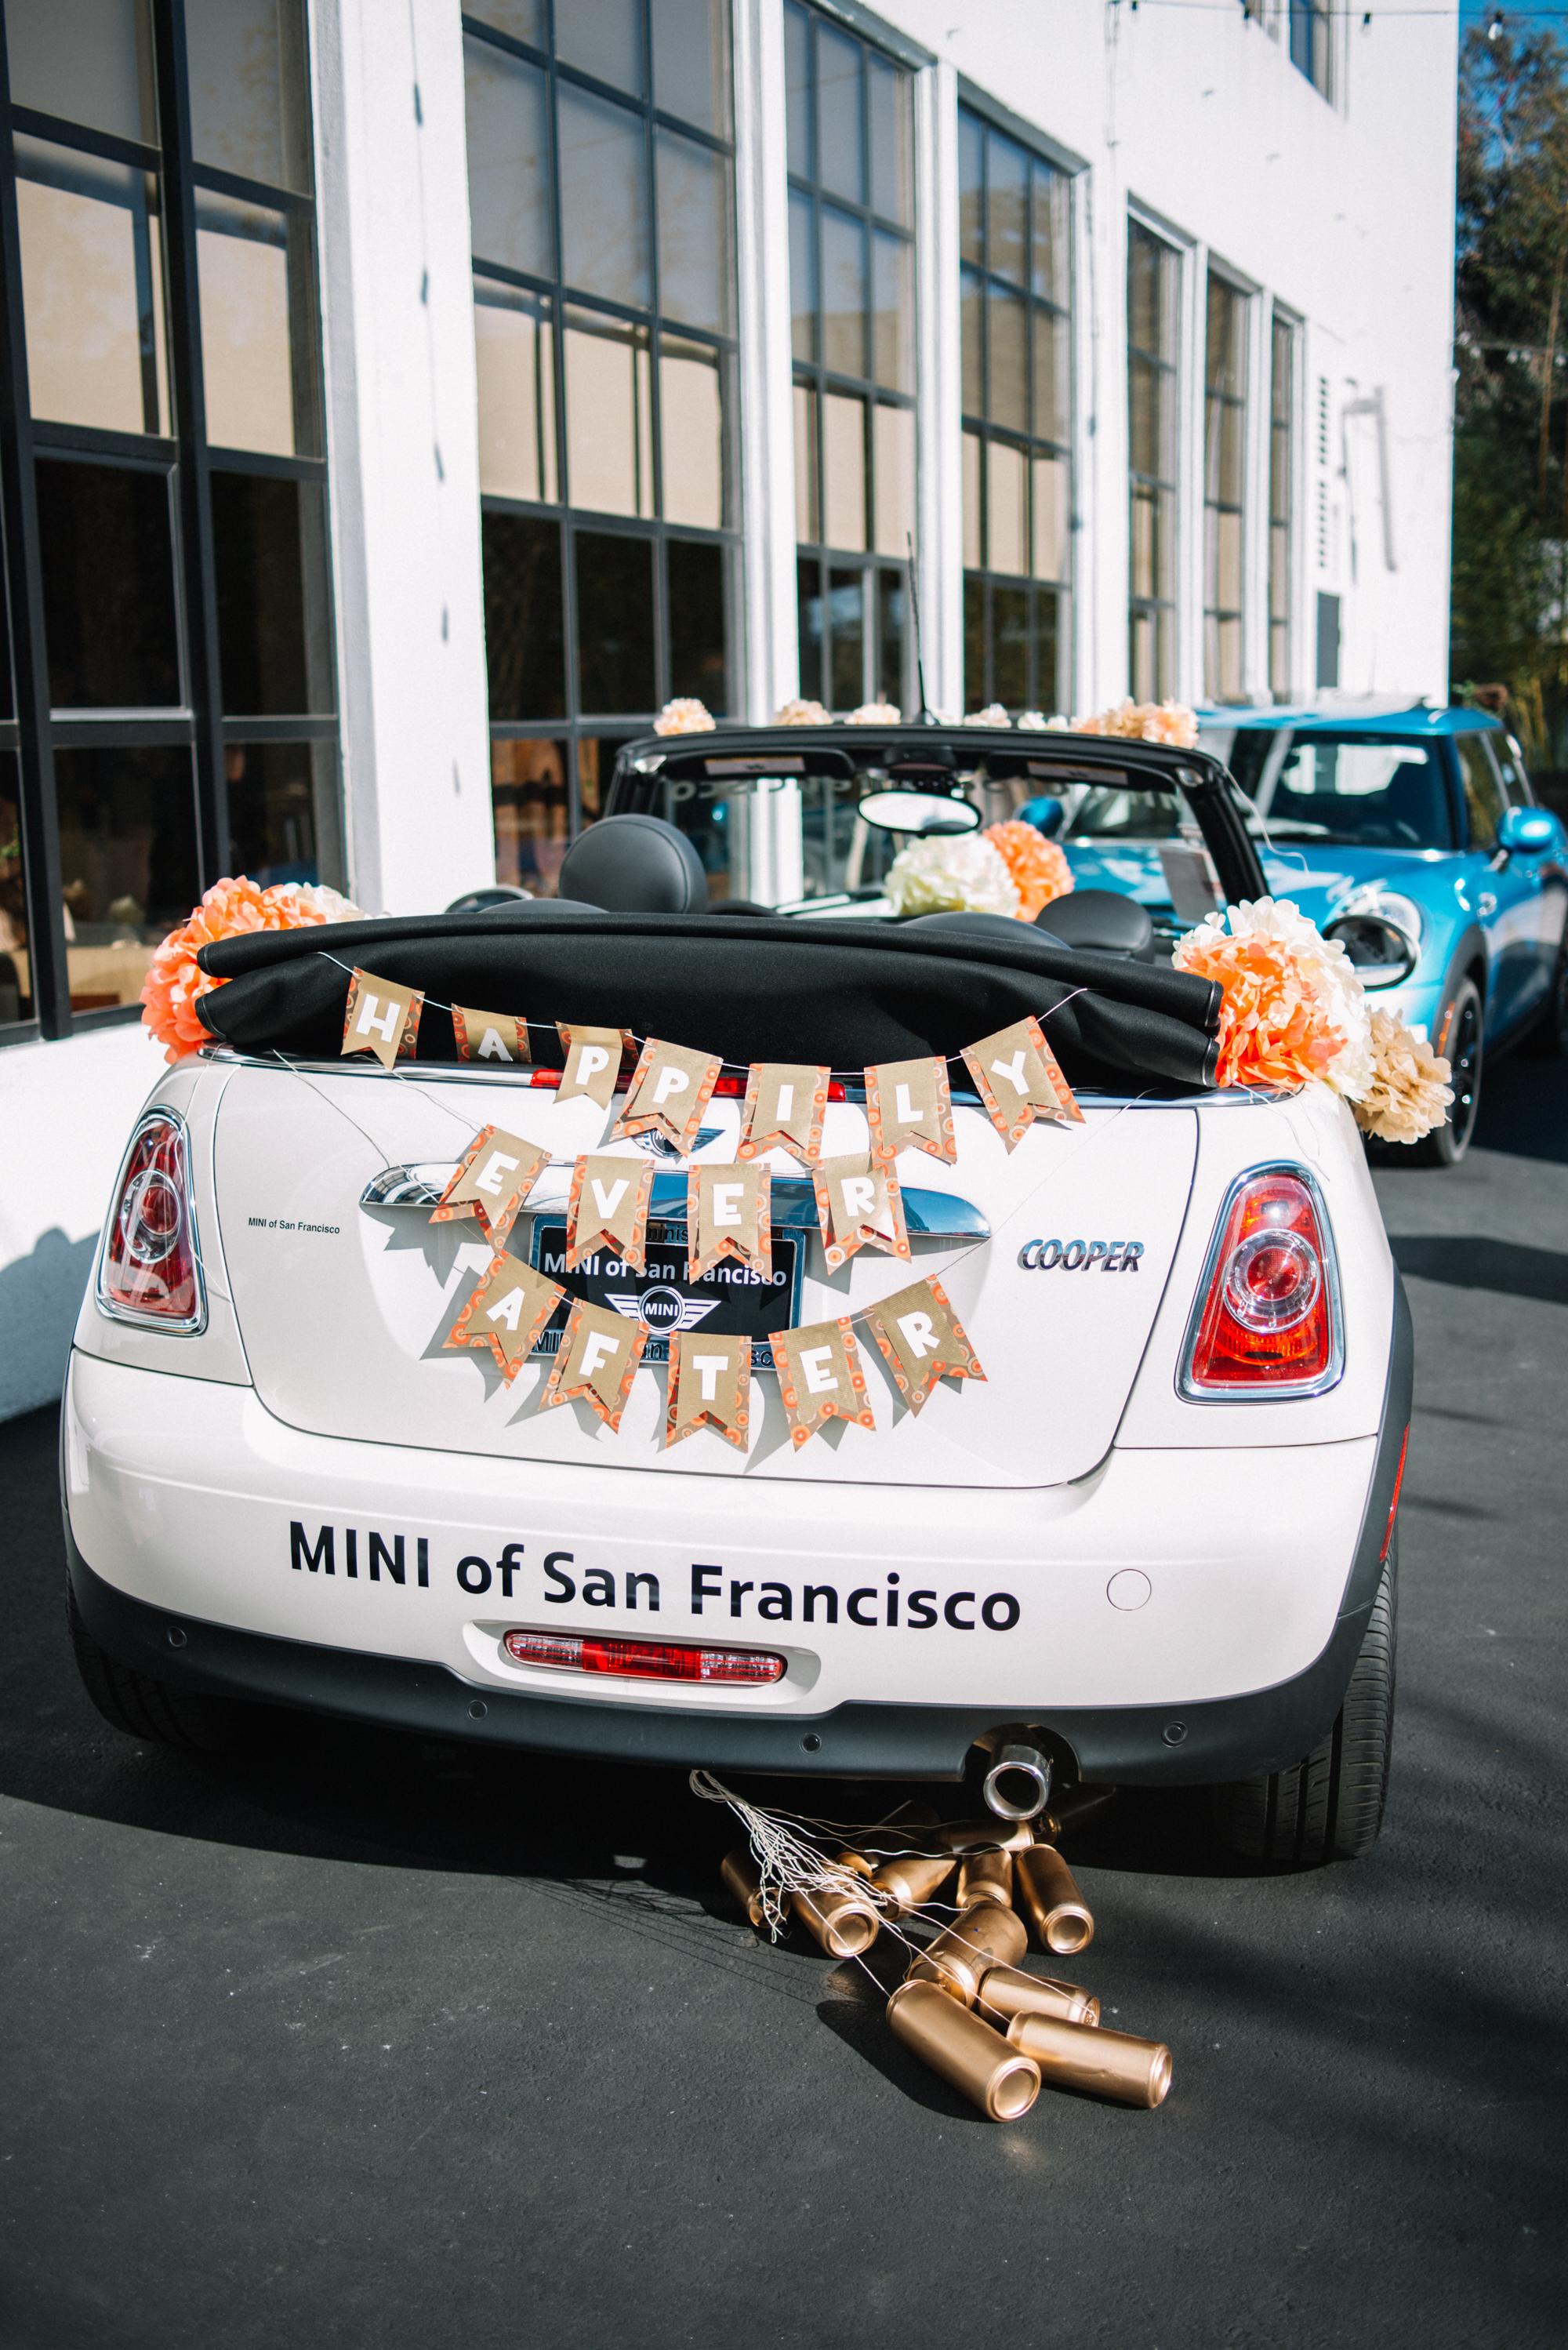 MINI of San Francisco